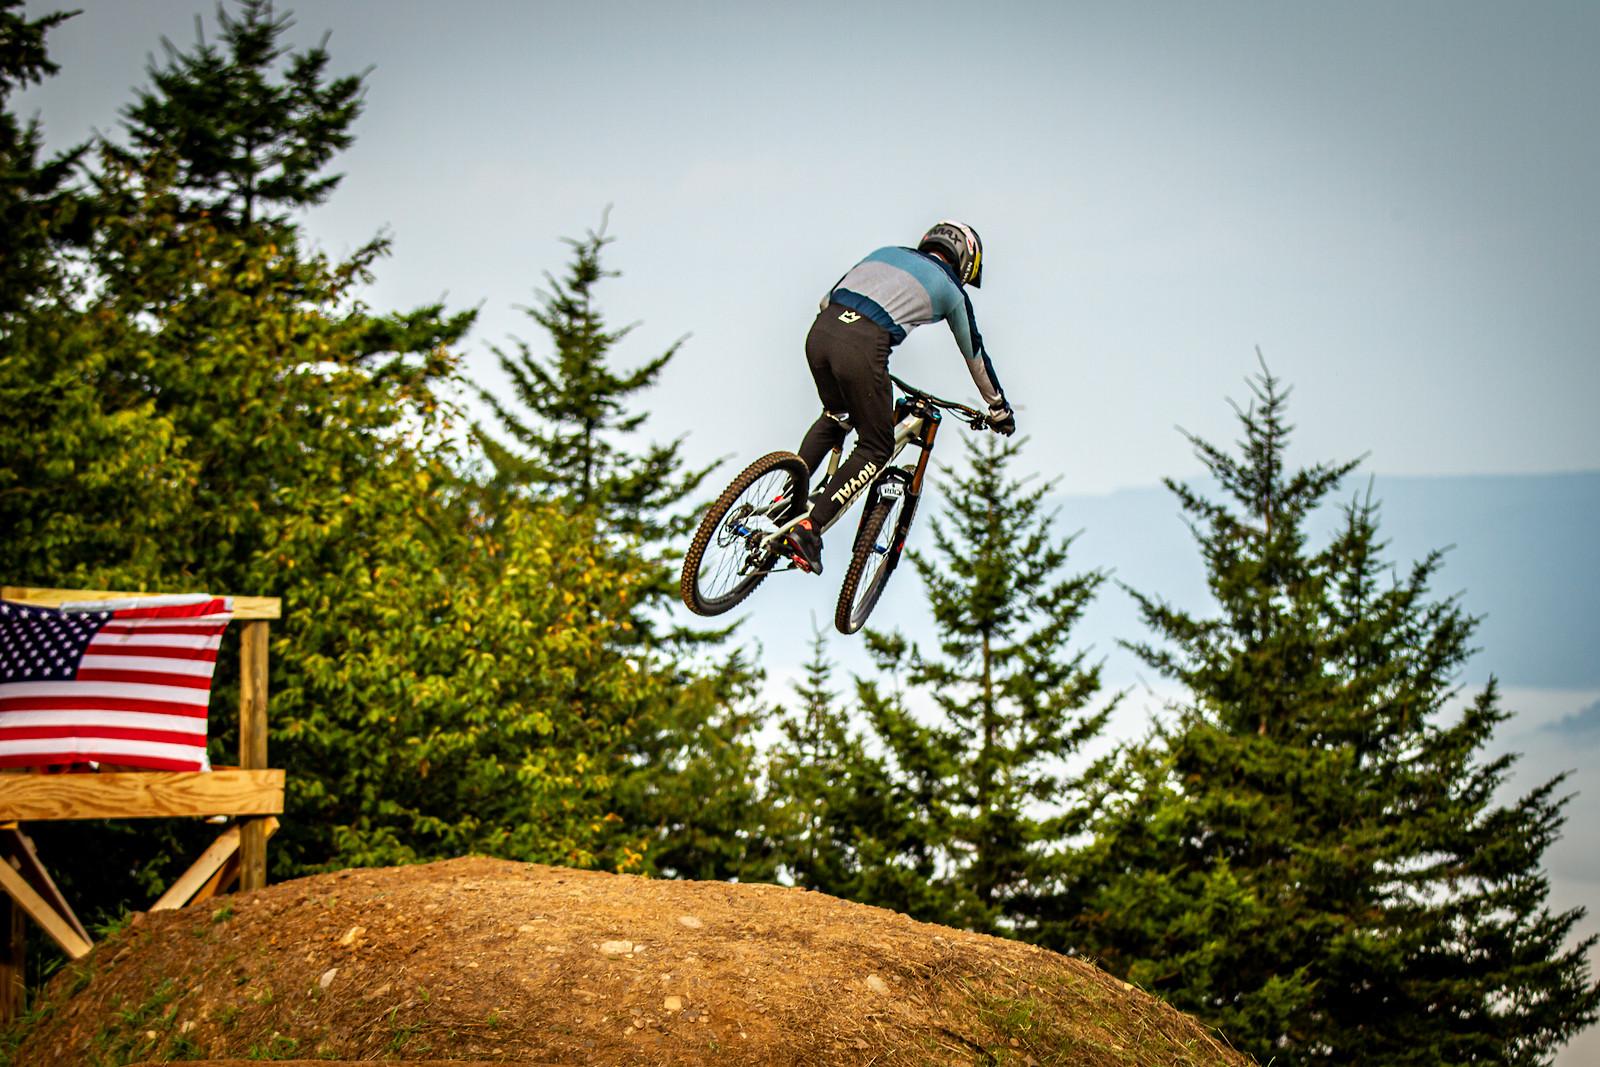 Max Morgan - JackRice - Mountain Biking Pictures - Vital MTB